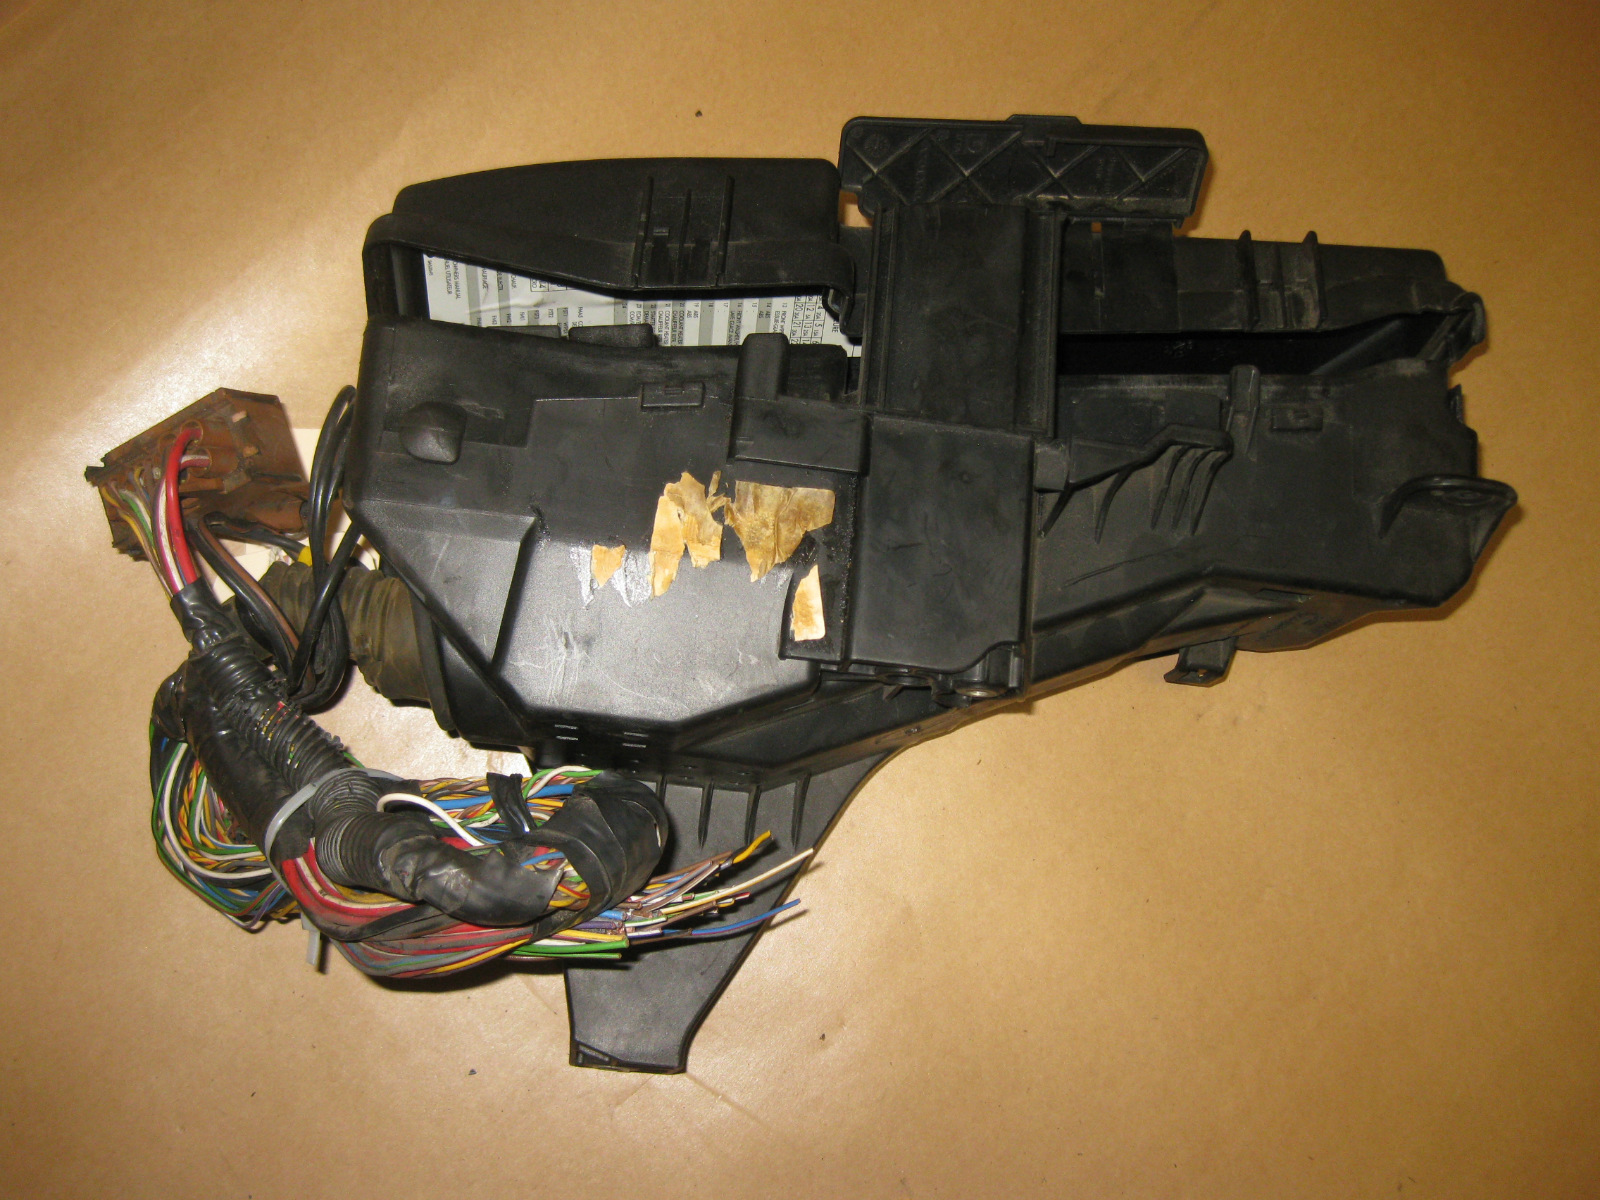 99 00 01 02 03 Volvo S80 Oem Under Hood Fuse Box W Fuses Part 9494210